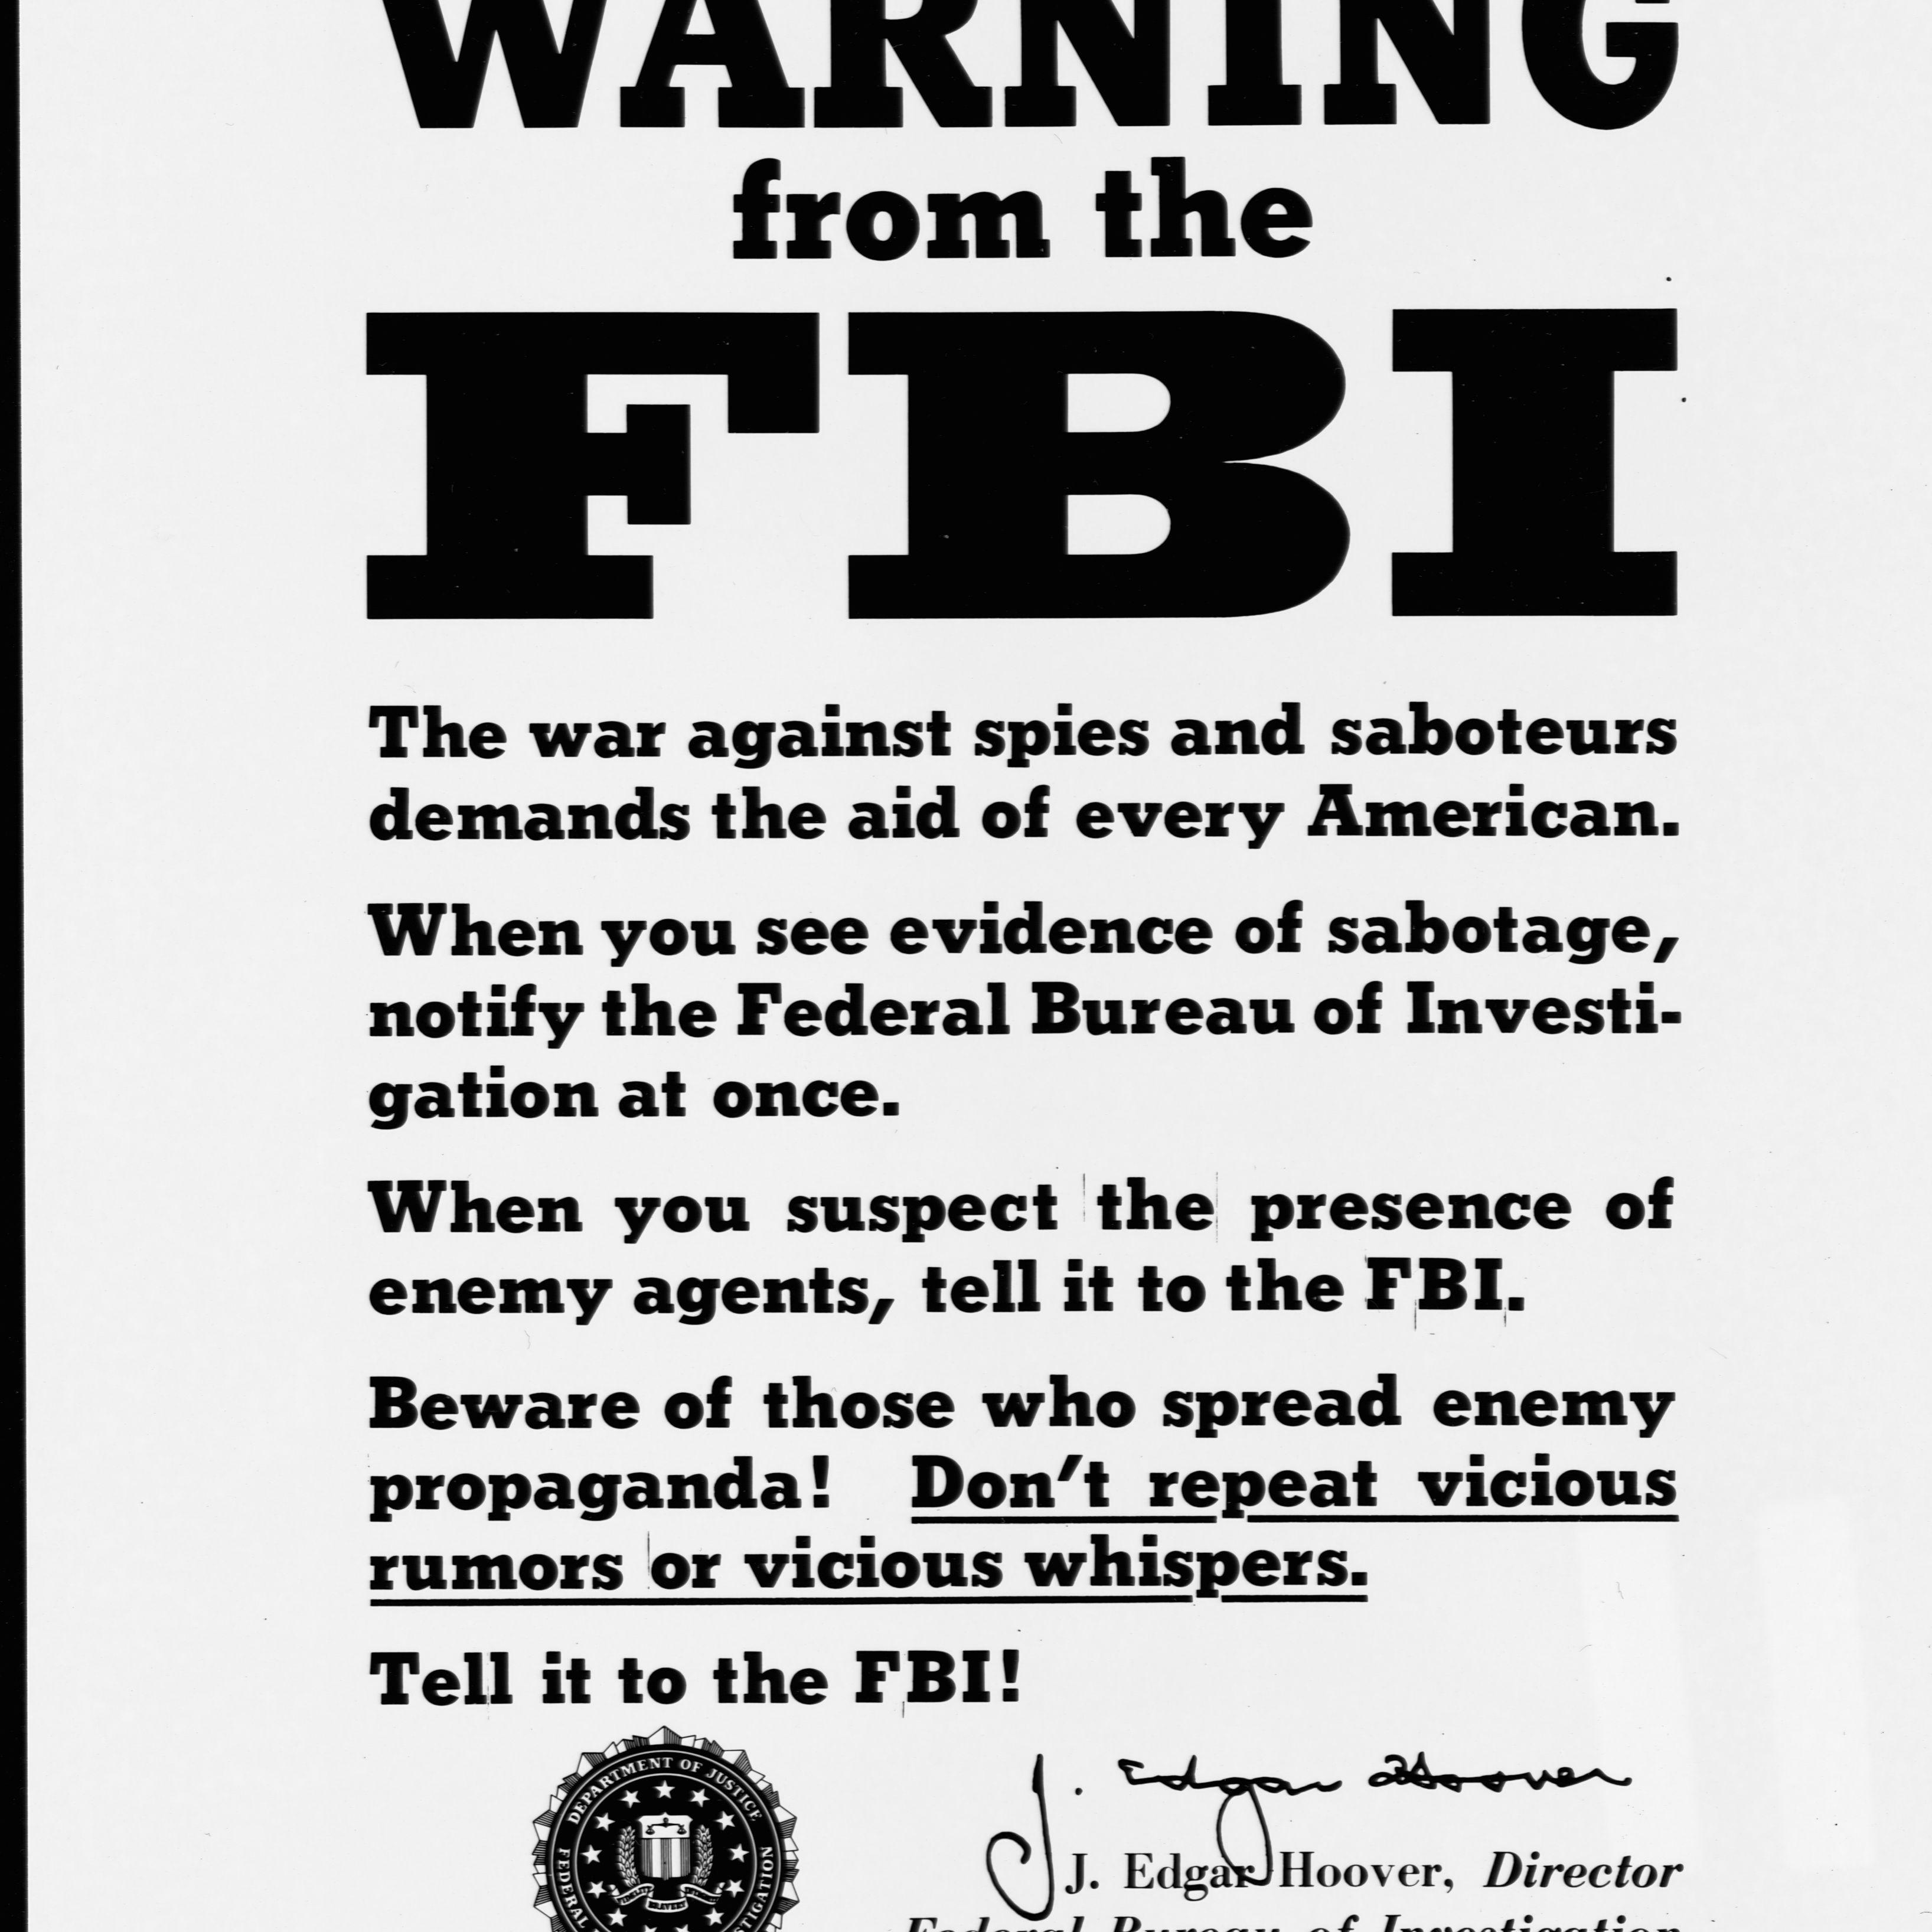 FBI Poster Warning Against Espionage